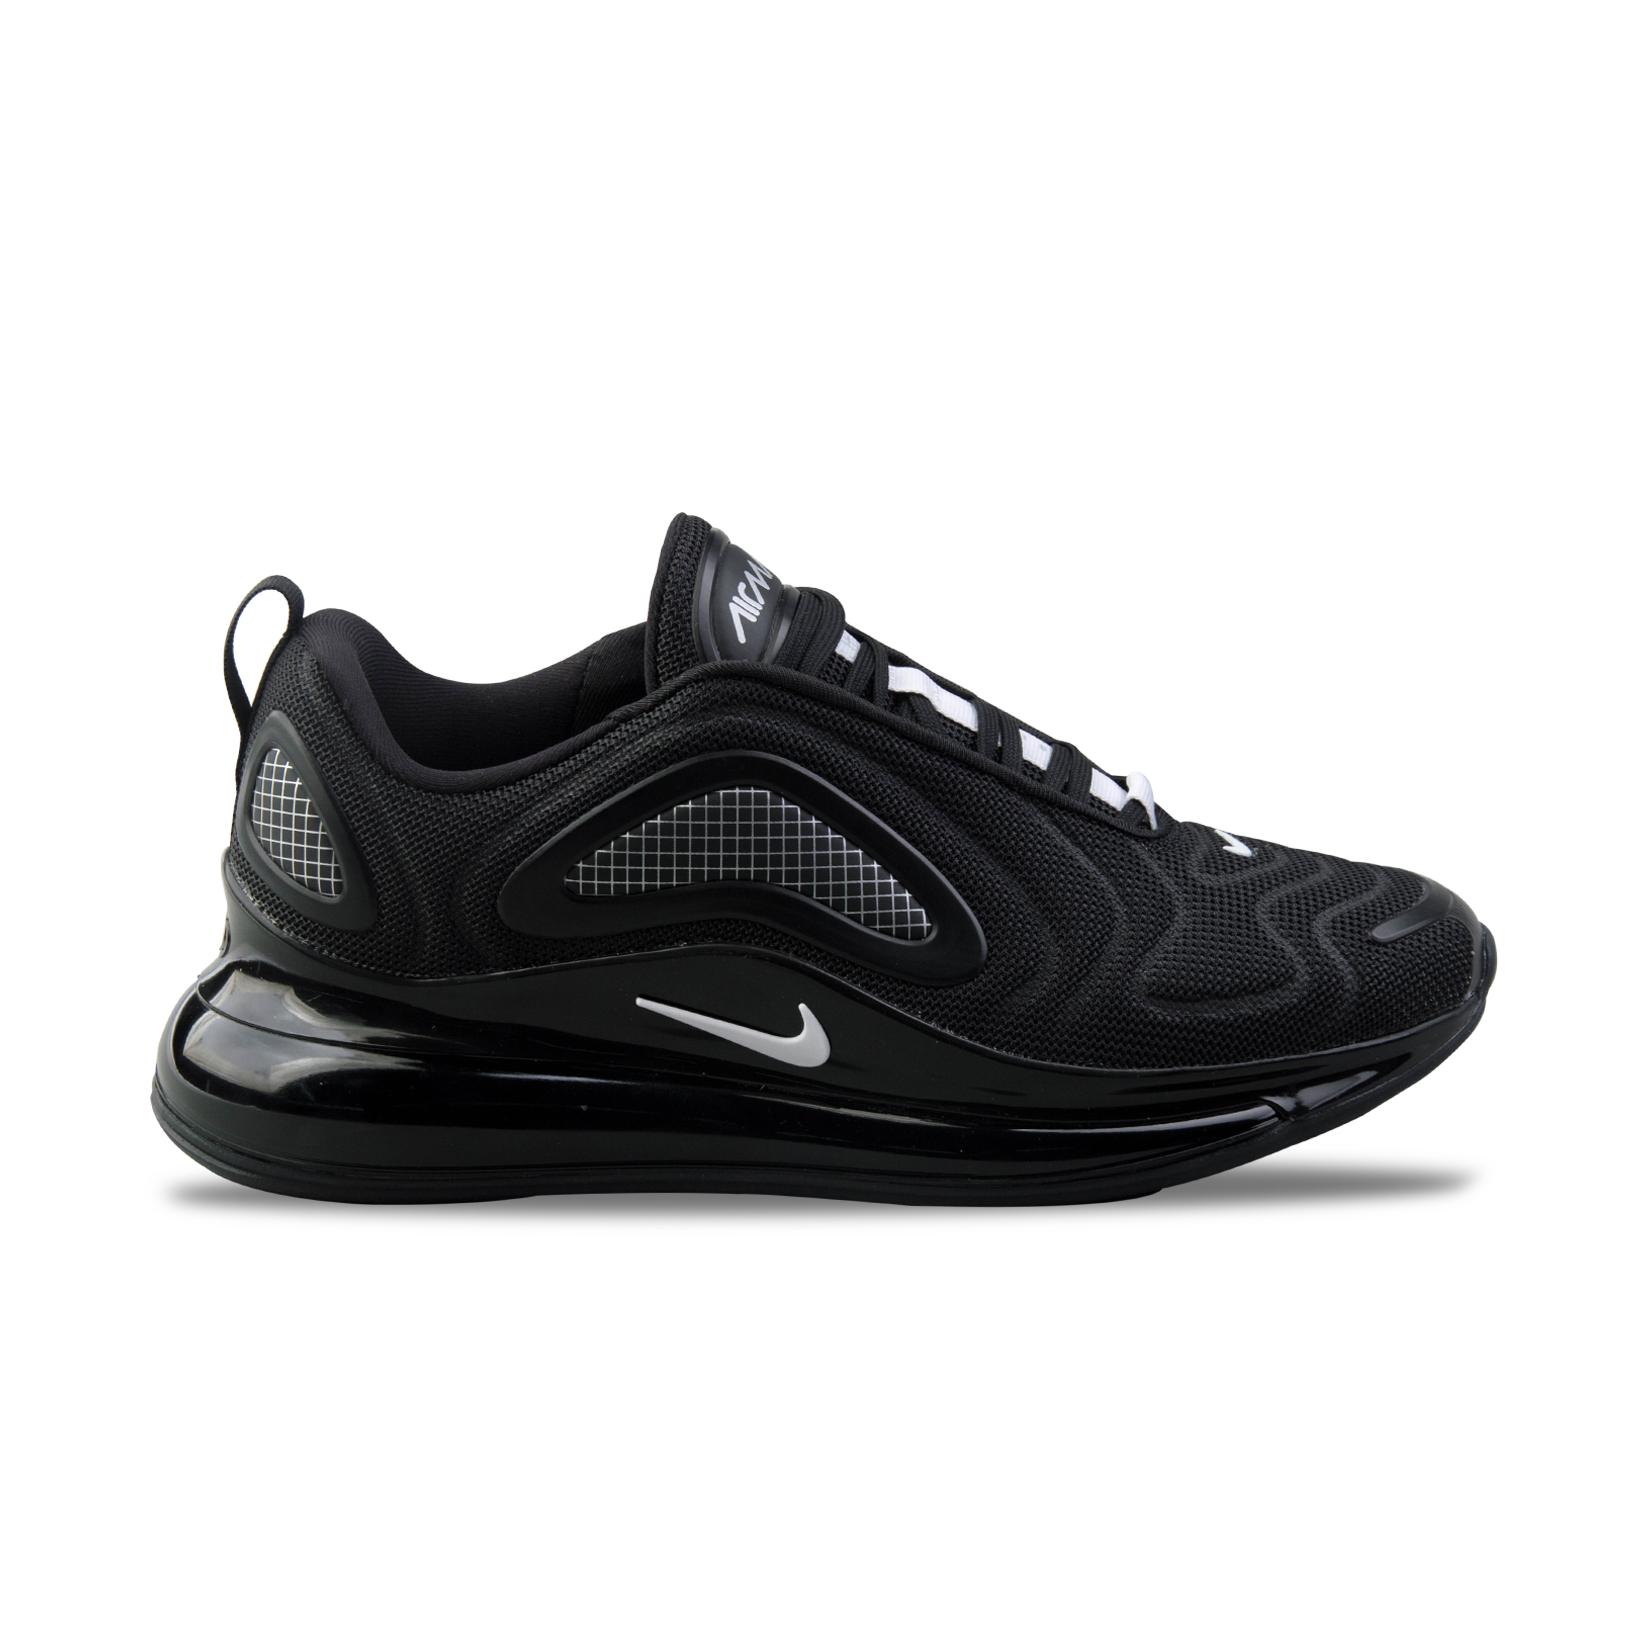 Nike Air Max 720 Black - White